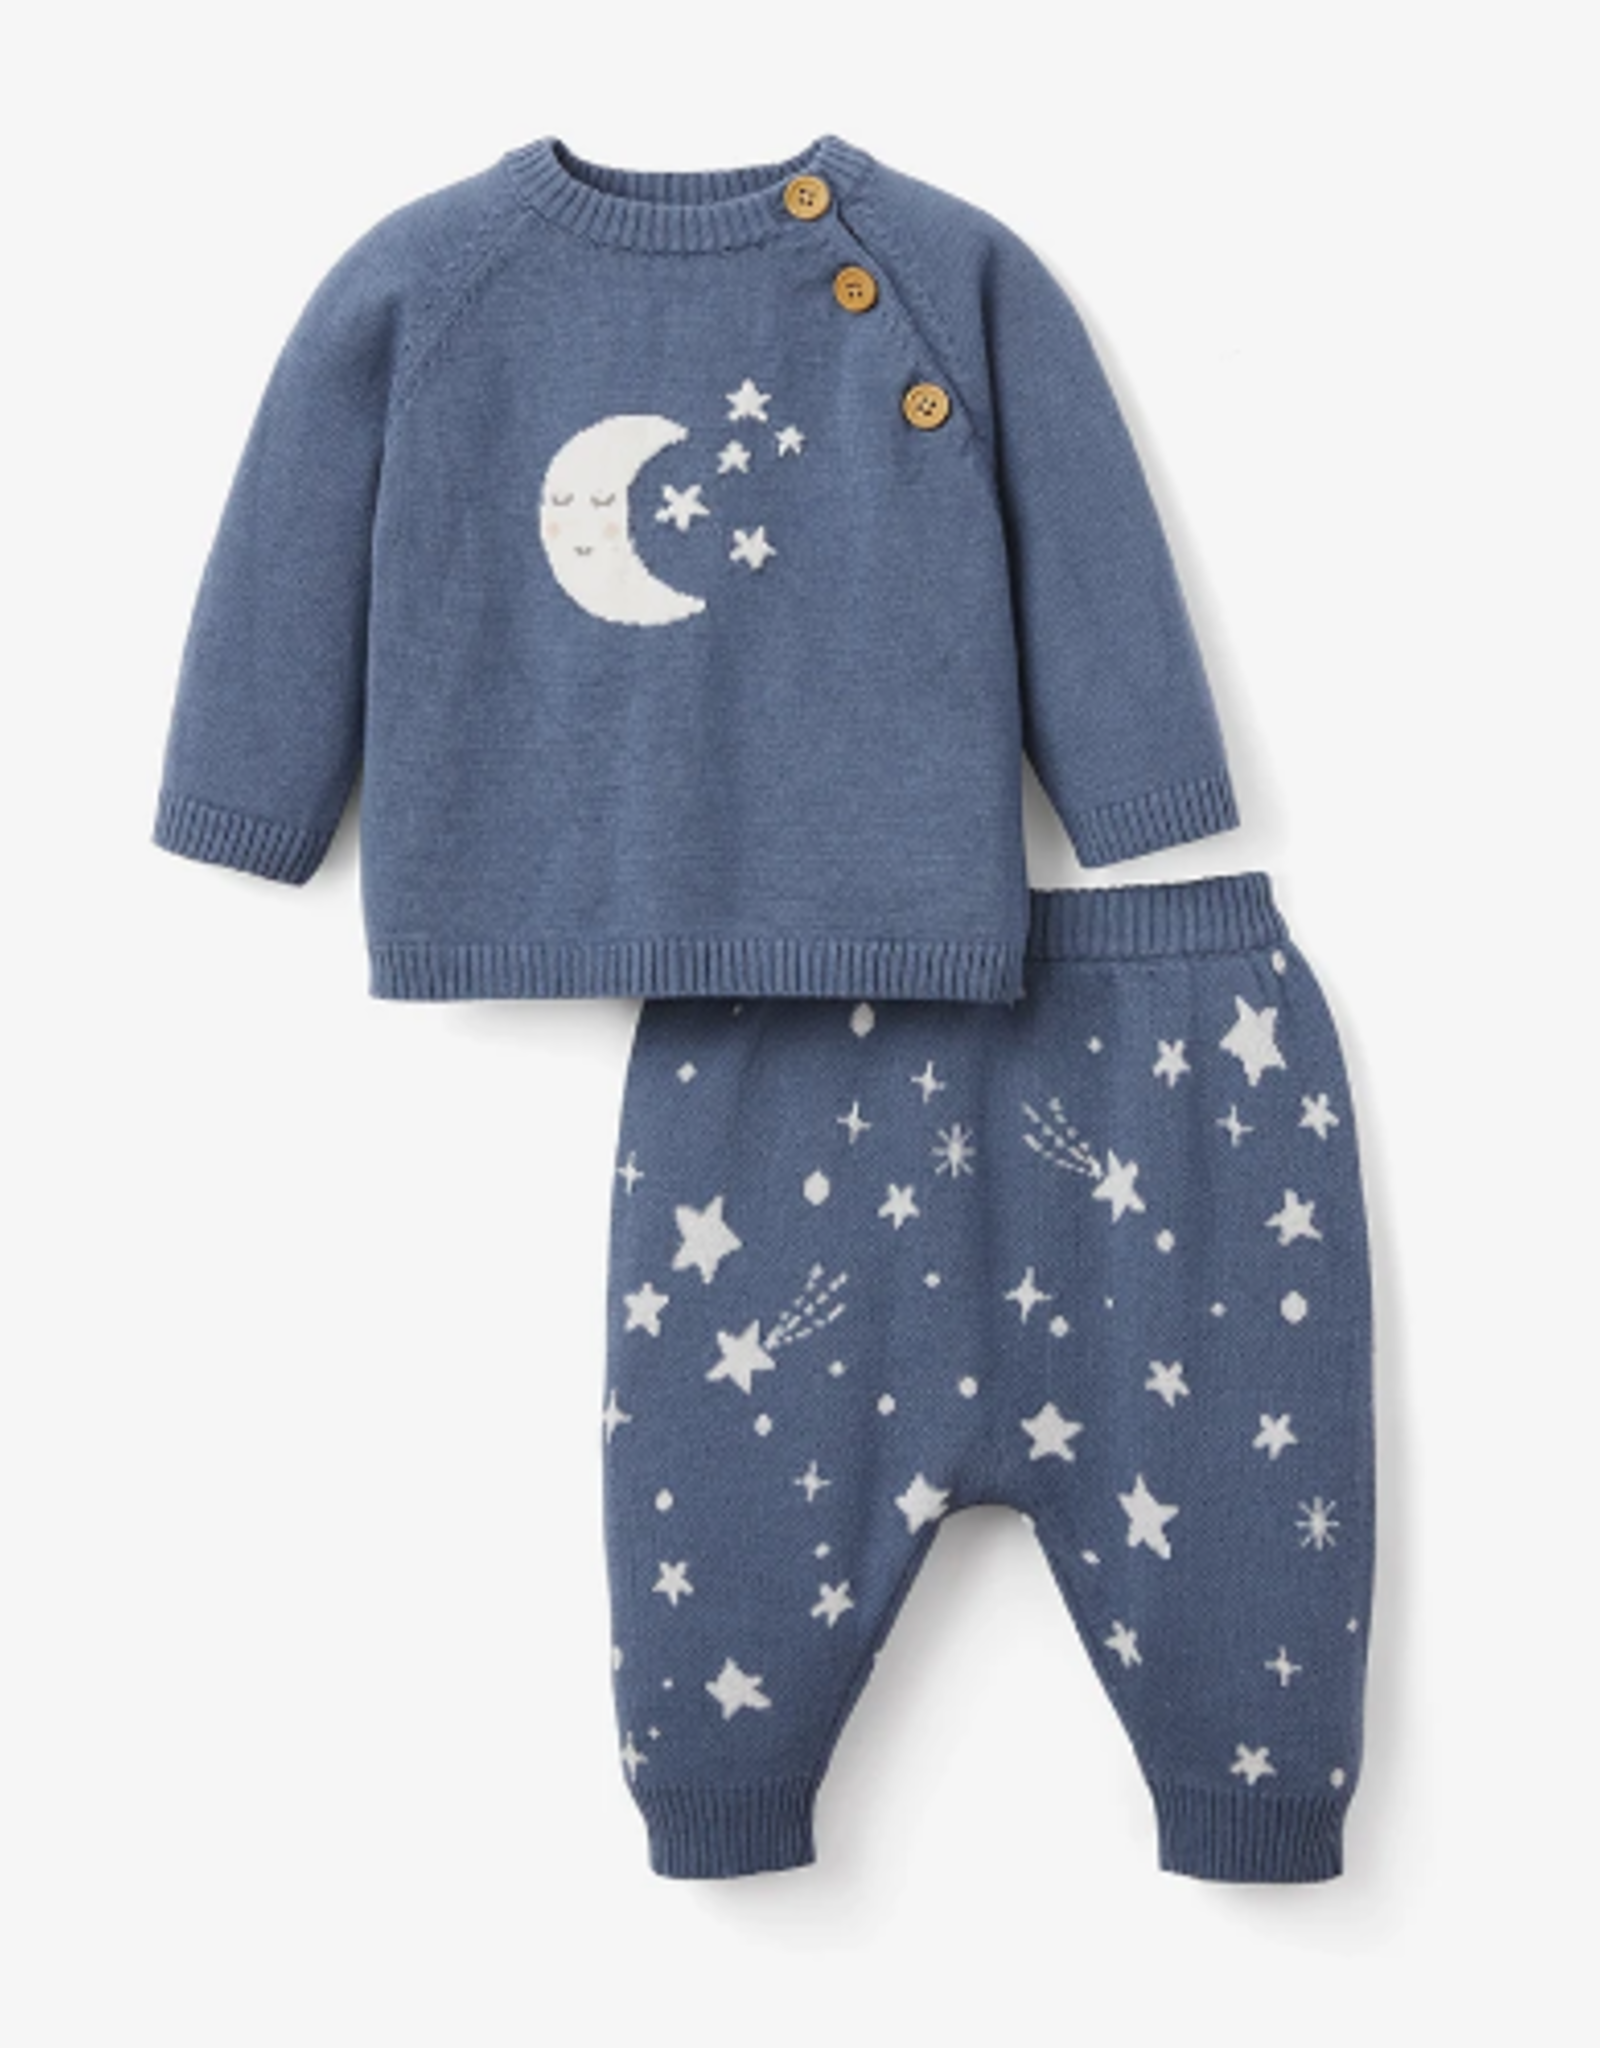 Celestial Pant Set